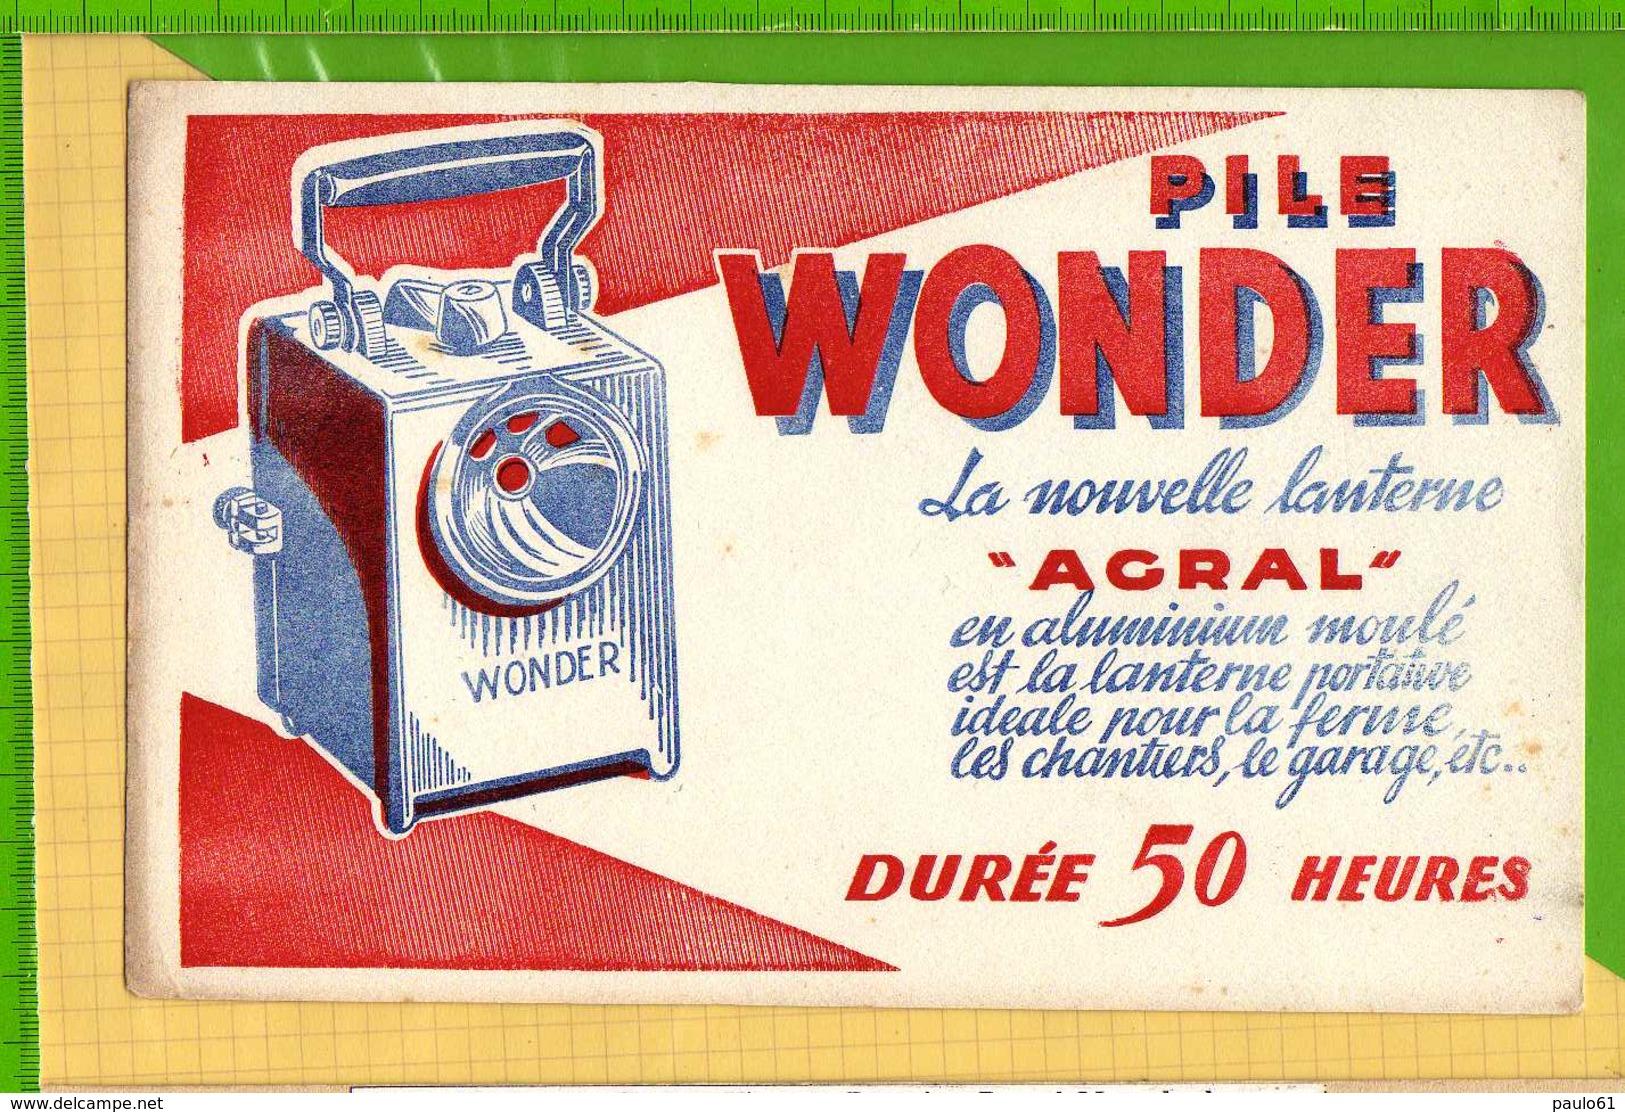 BUVARD & Blotting Paper : Pile Wonder La Nouvelle Lanterne AGRAL - Piles